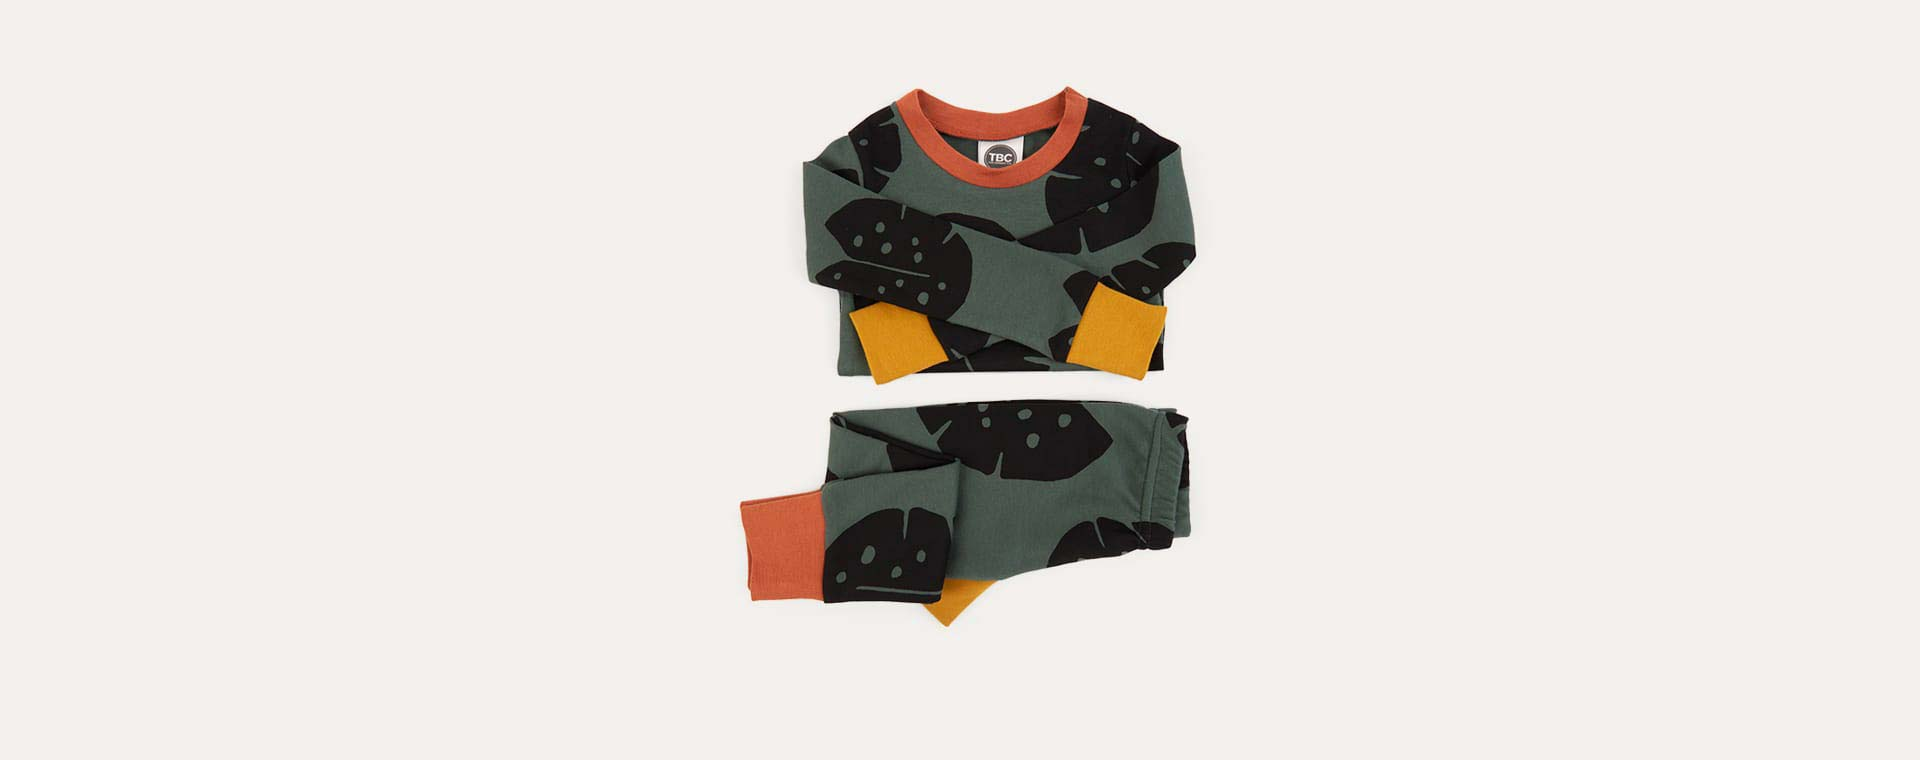 Monstera Forrest The Bright Company Slim Jyms Pyjamas